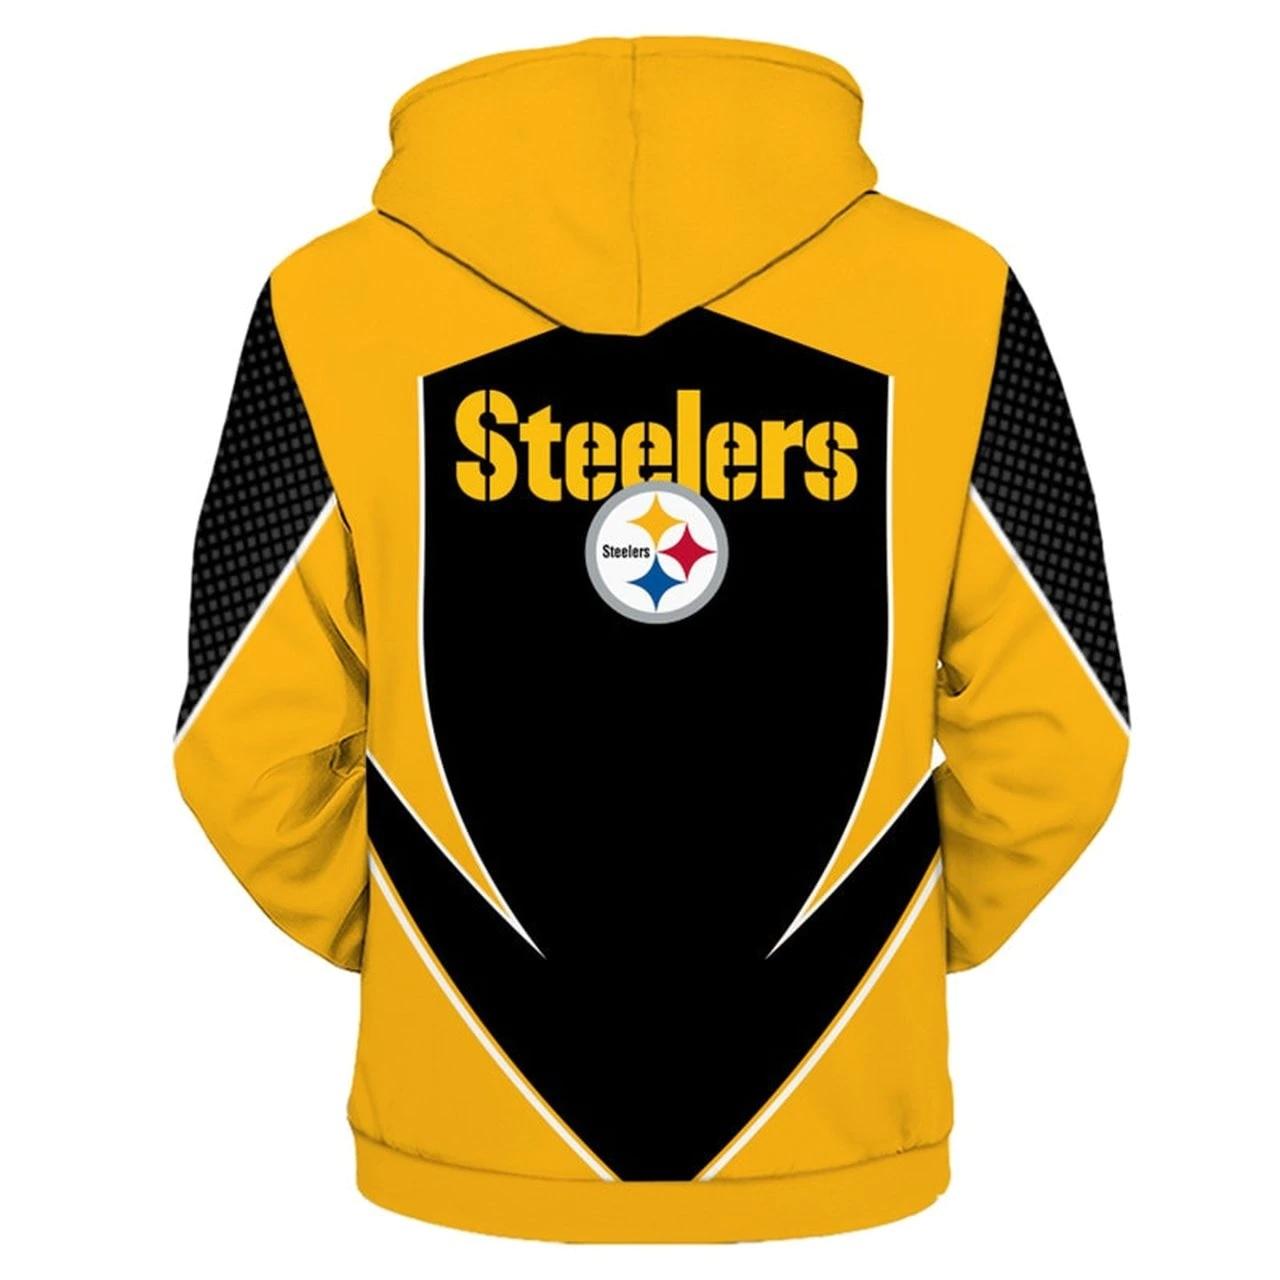 NFL pittsburgh steelers all over print hoodie - back